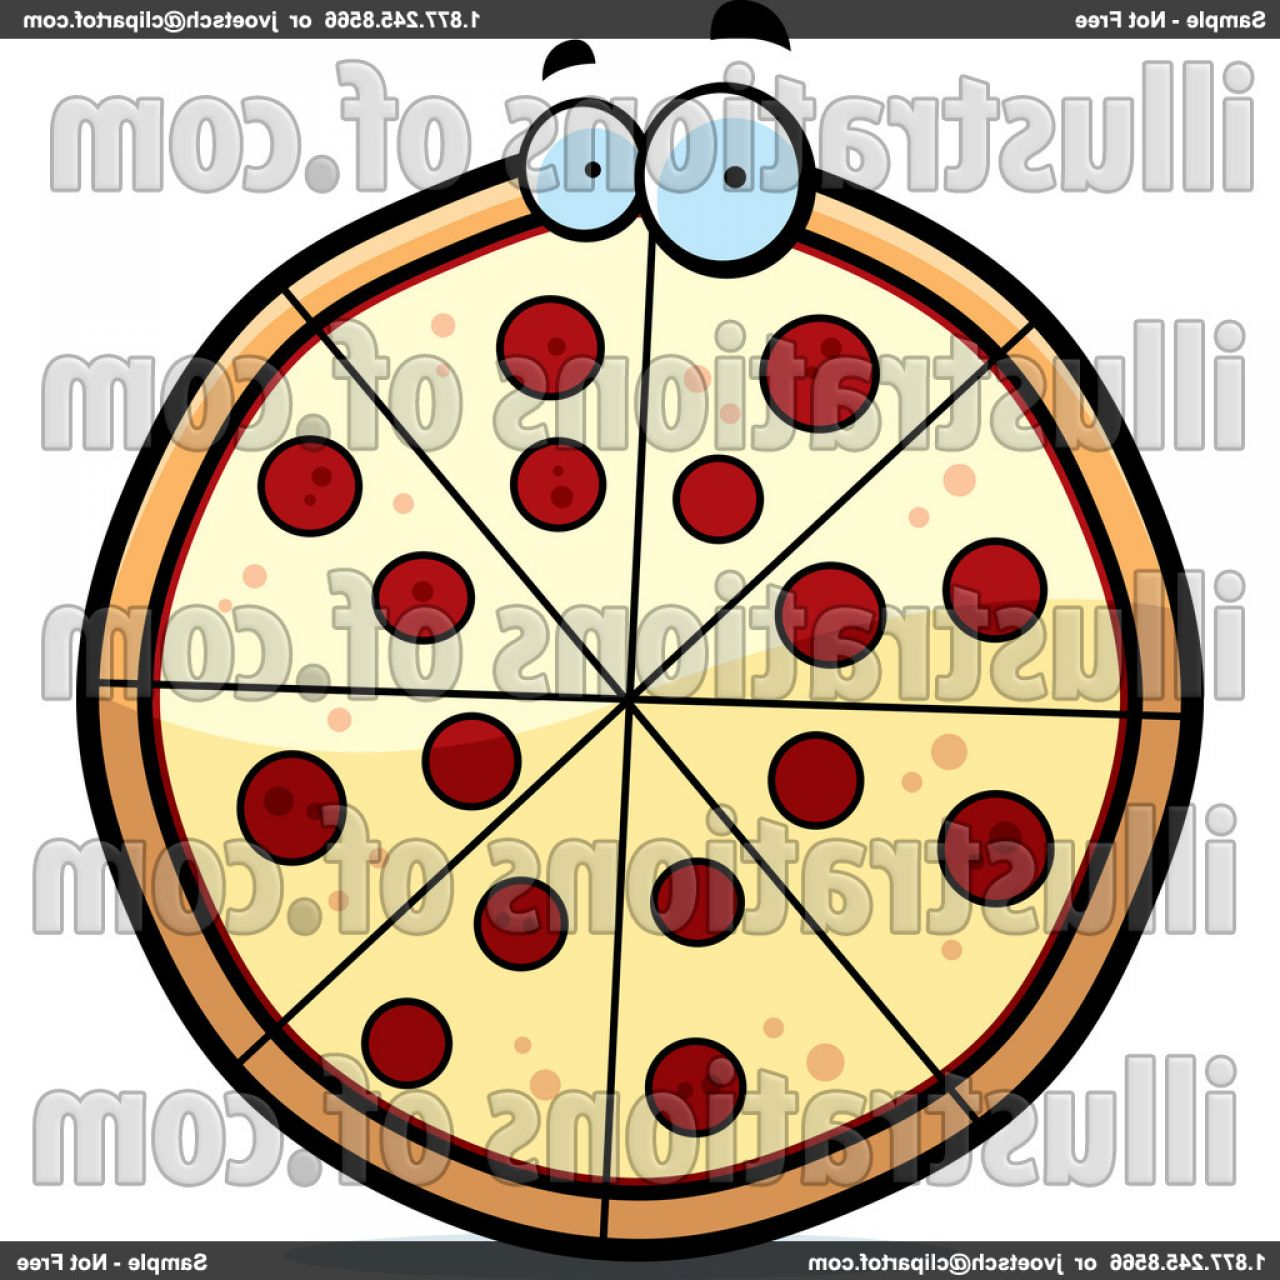 whole%20pizza%20clip%20art%20black%20and%20white